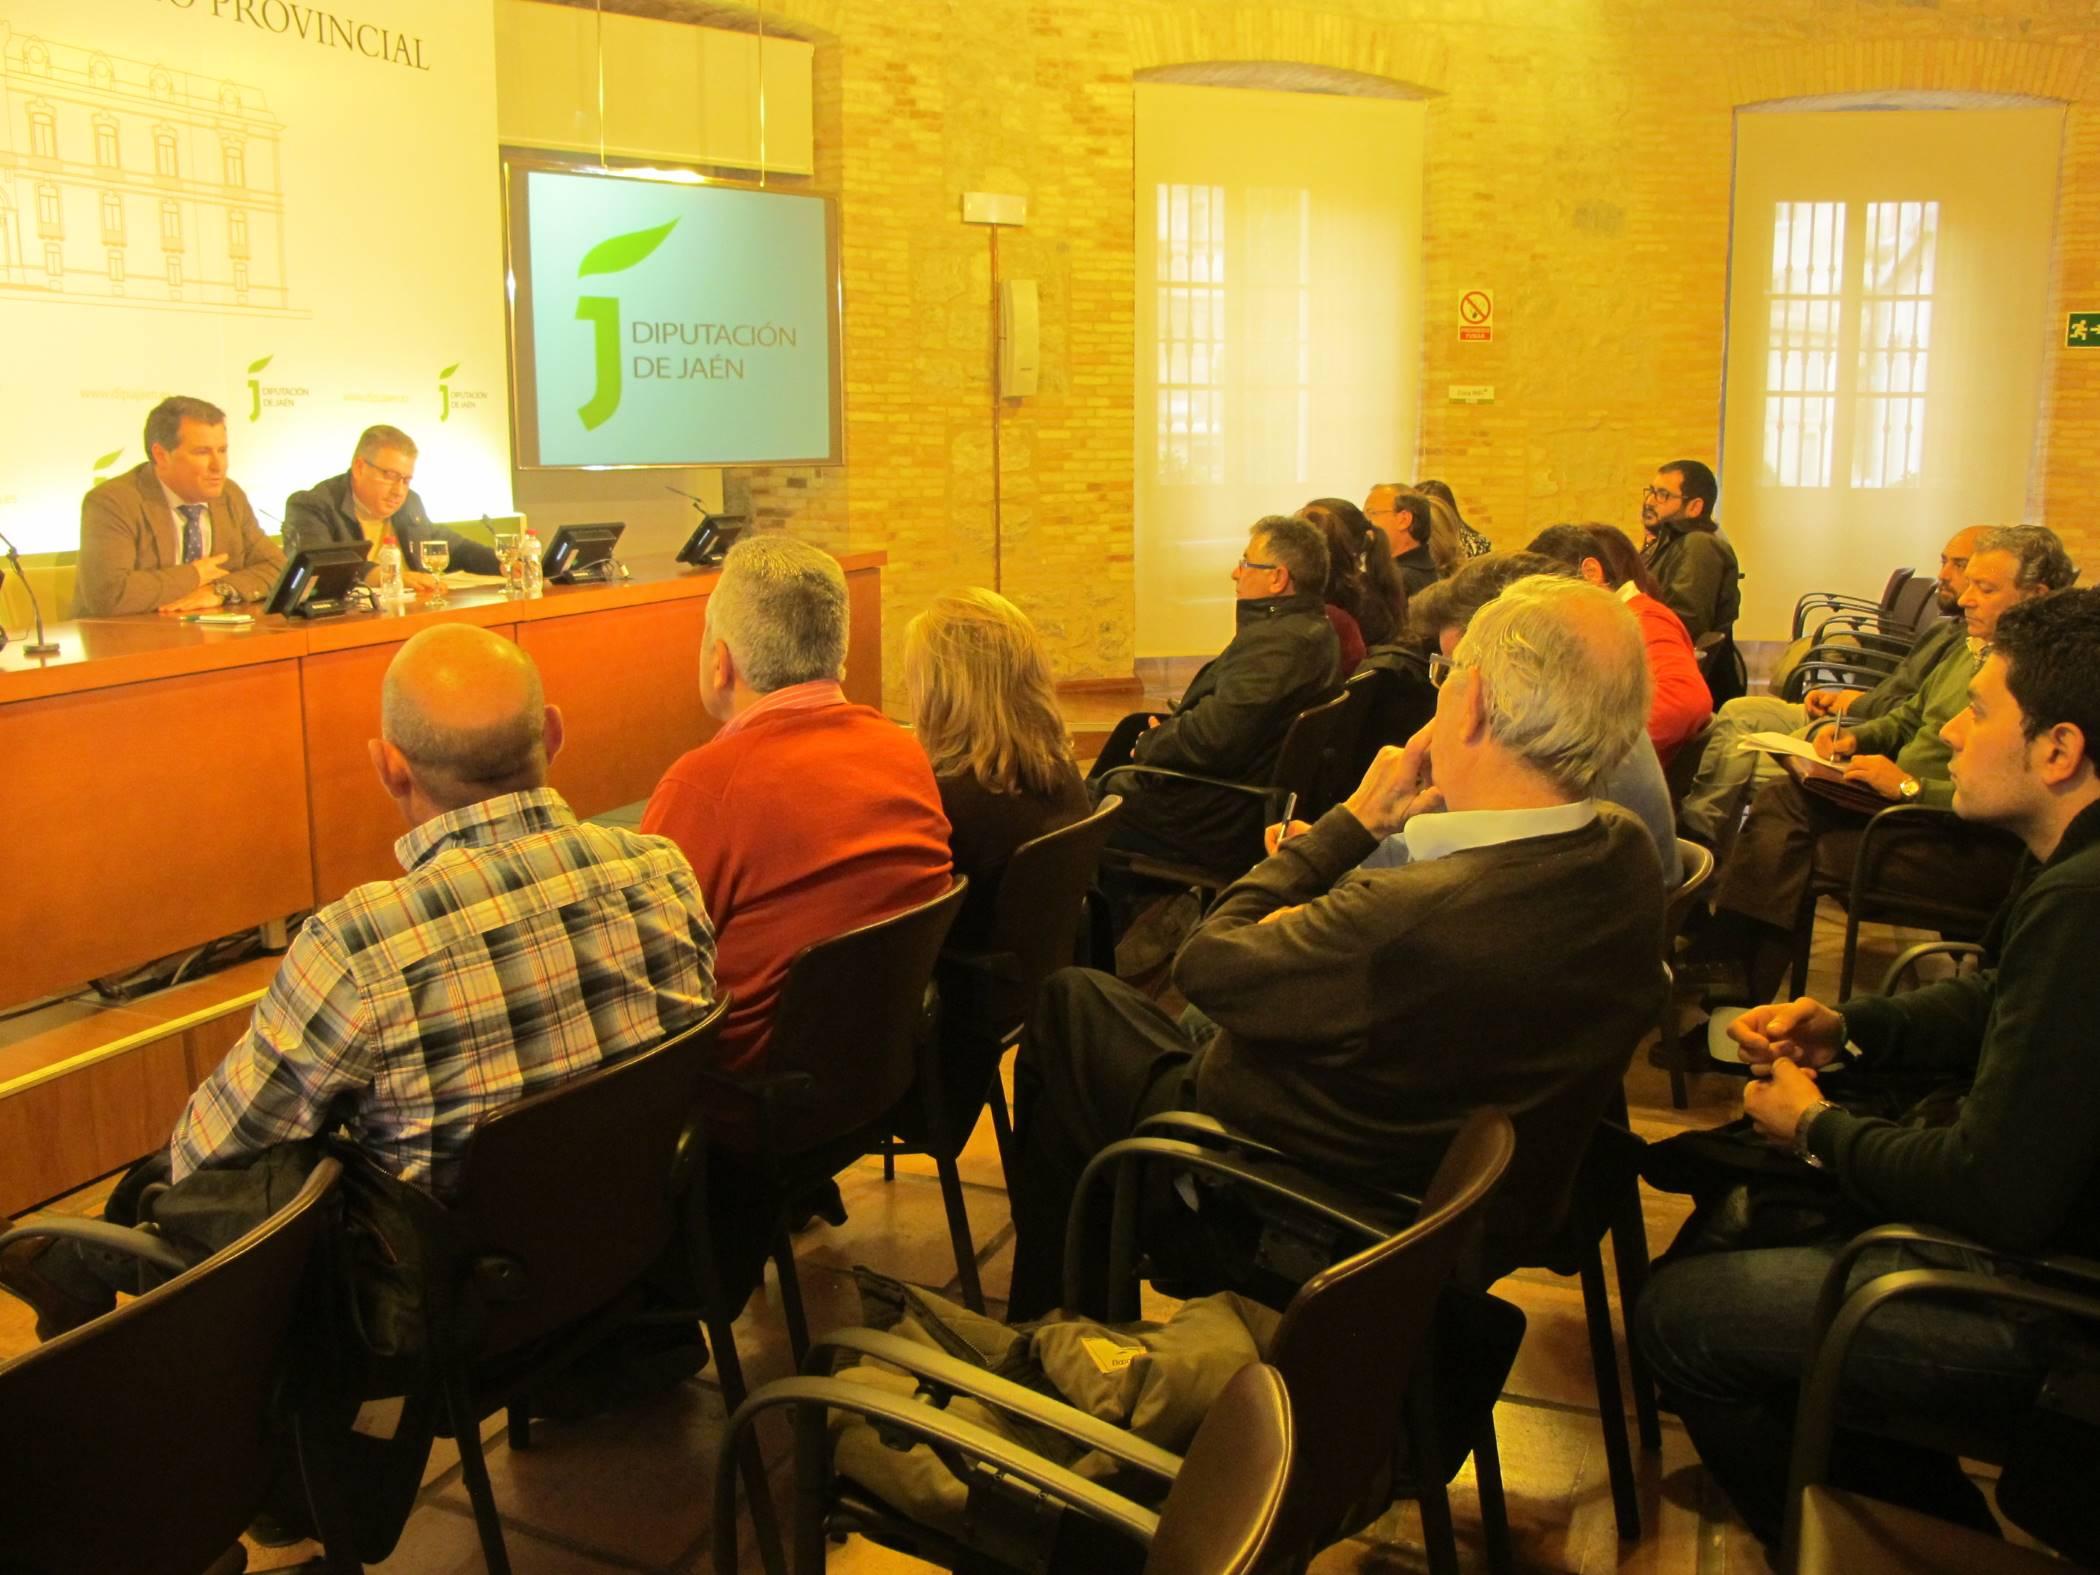 20160118_Asamblea_empresas_productoras_agroalimentarias_-_Degusta_Jaxn_1